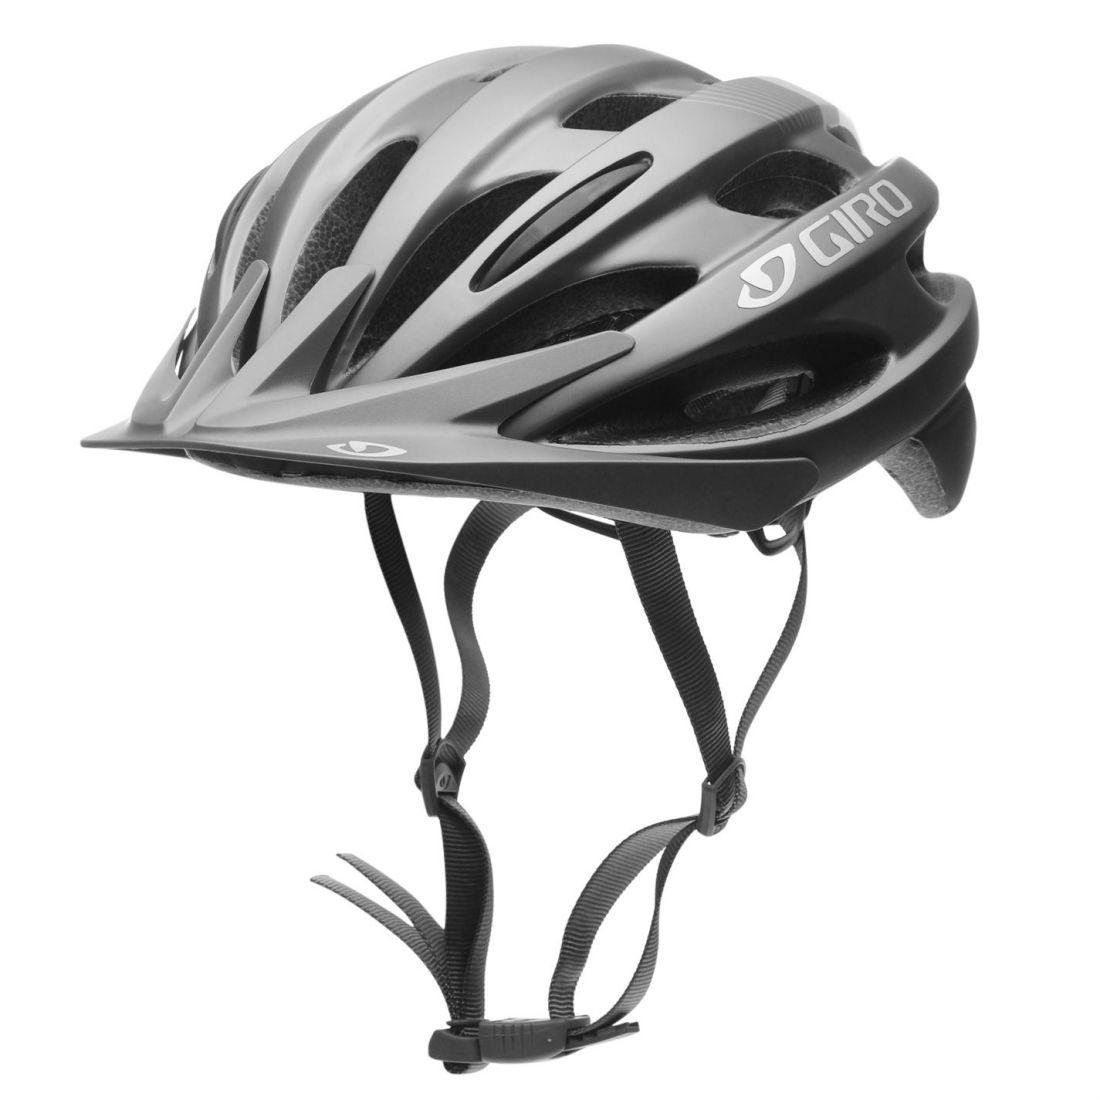 Giro Revel Helmet Adults Unisex Cycle